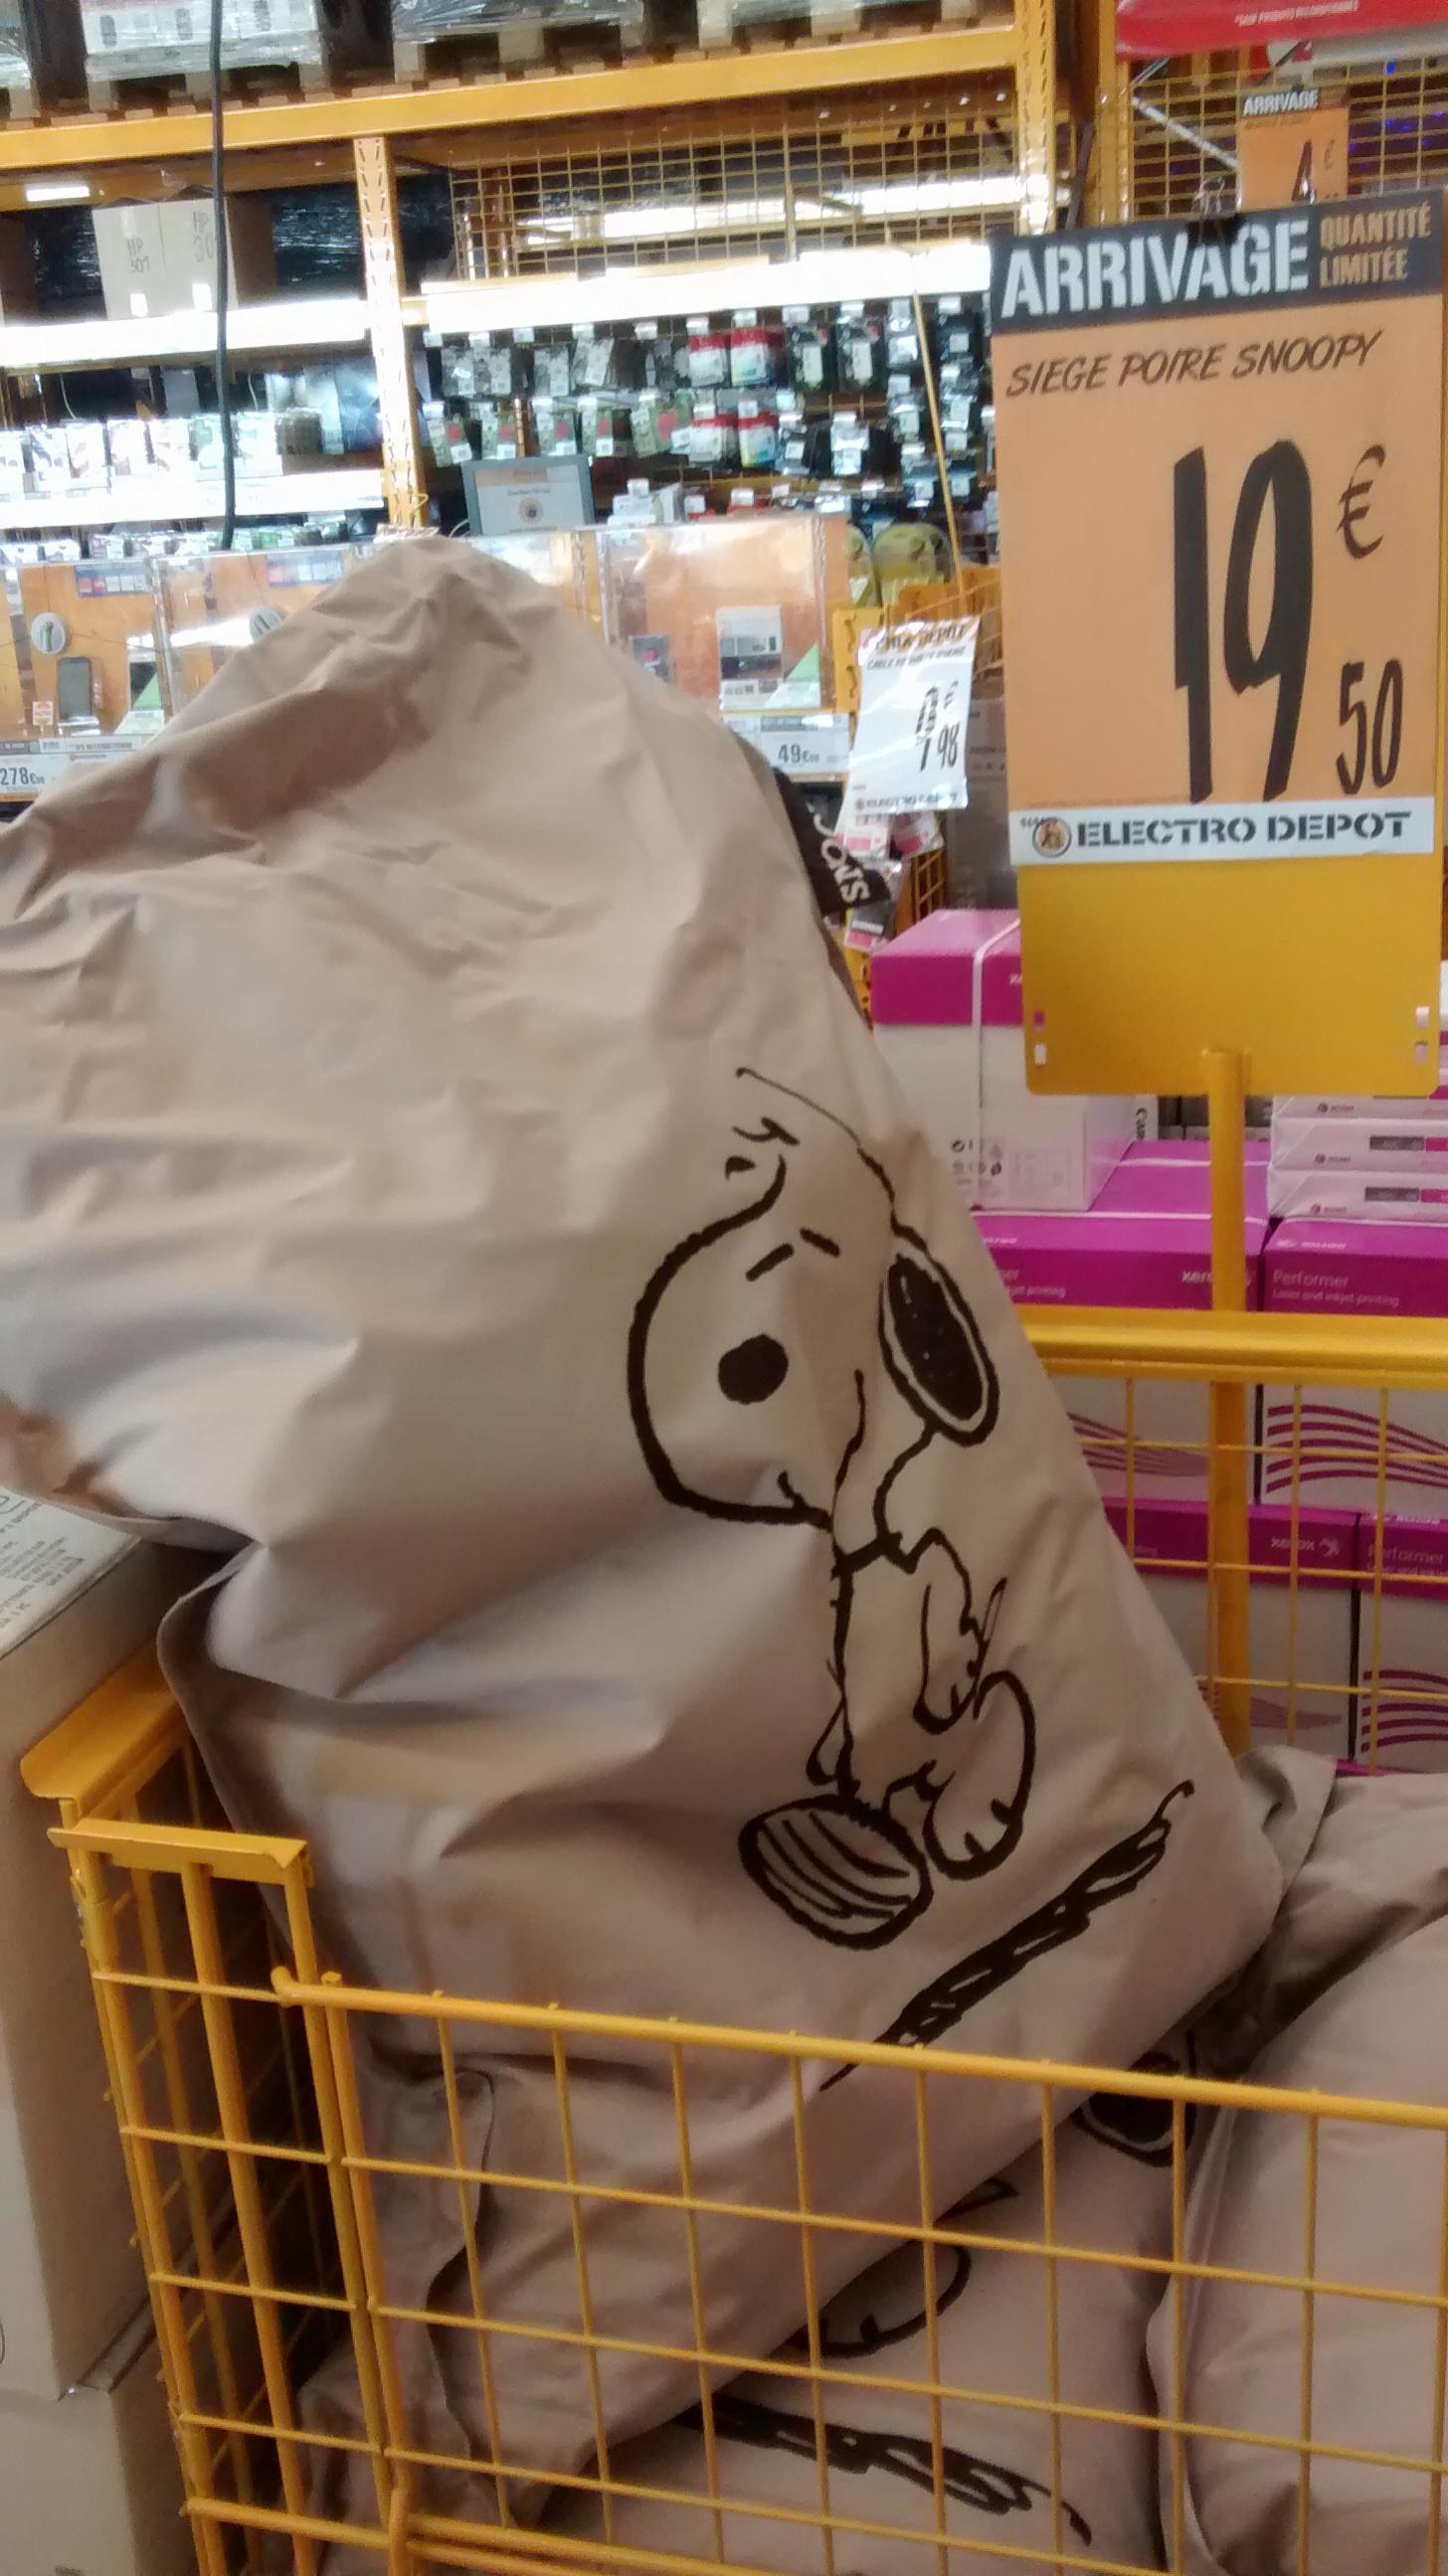 Siège poire Snoopy (100 x 130 cm)